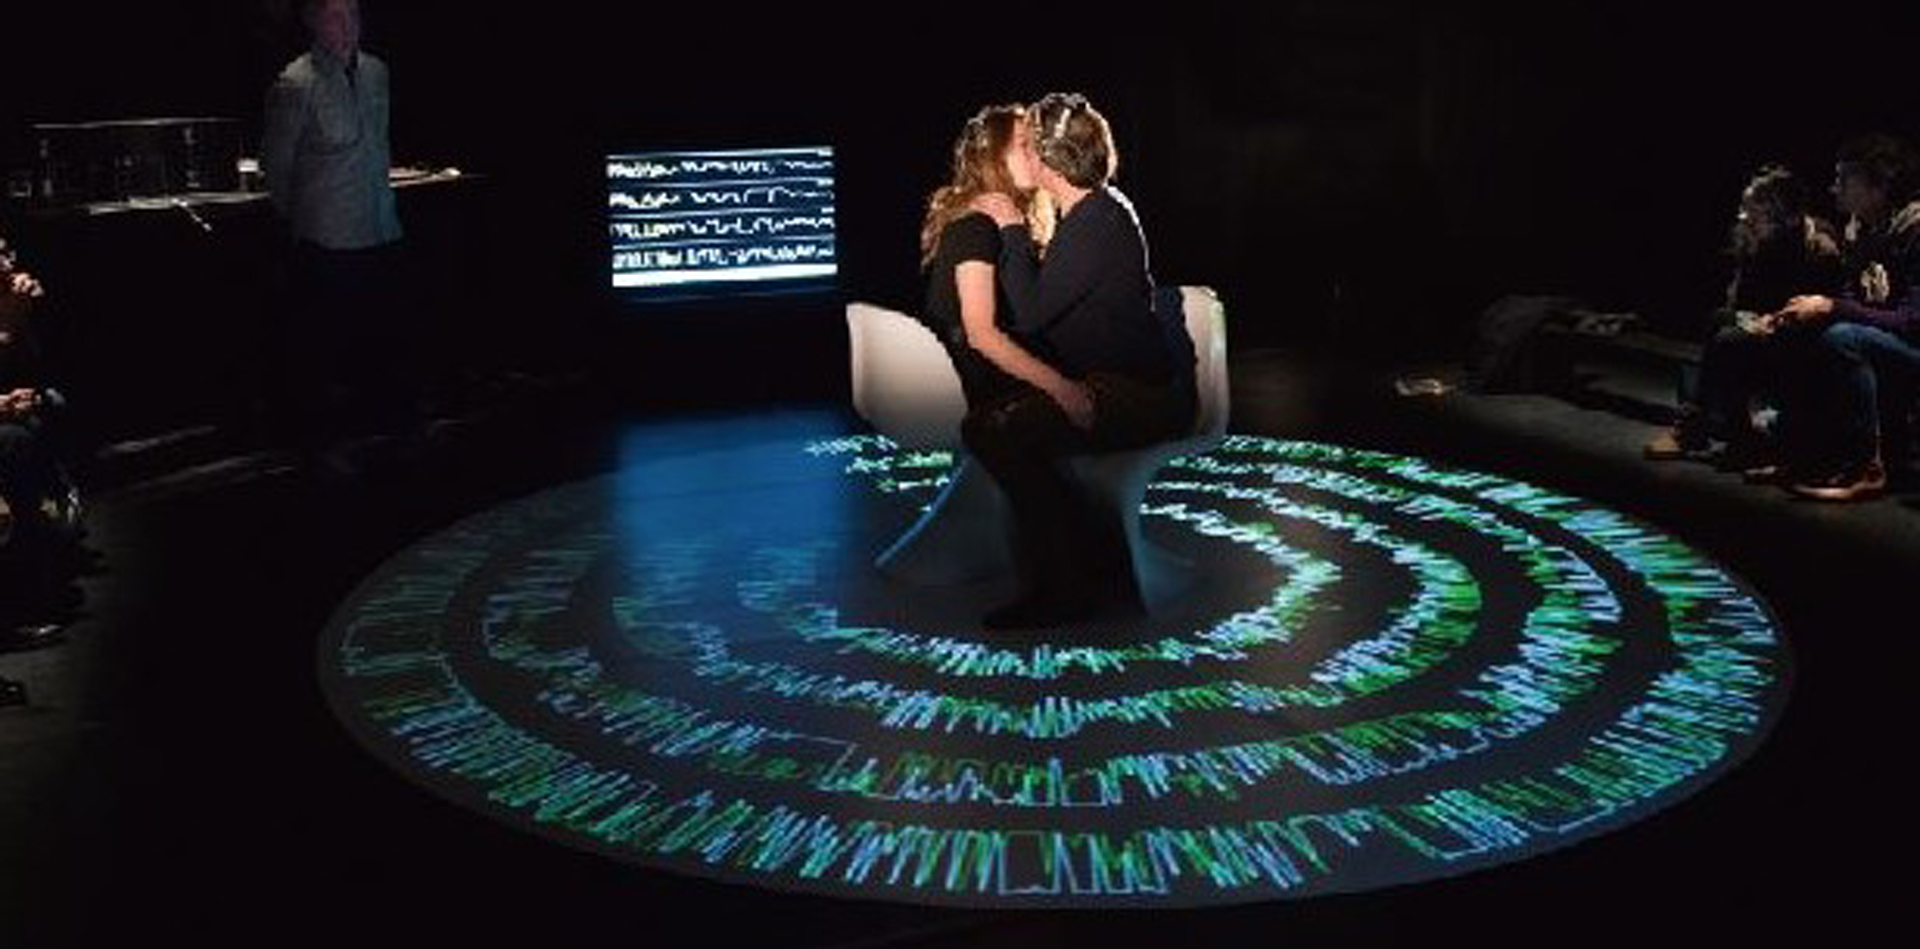 ©, Karen Anne Lancel and Hermen Maat, Shared Senses: Intimacy Data Symphony